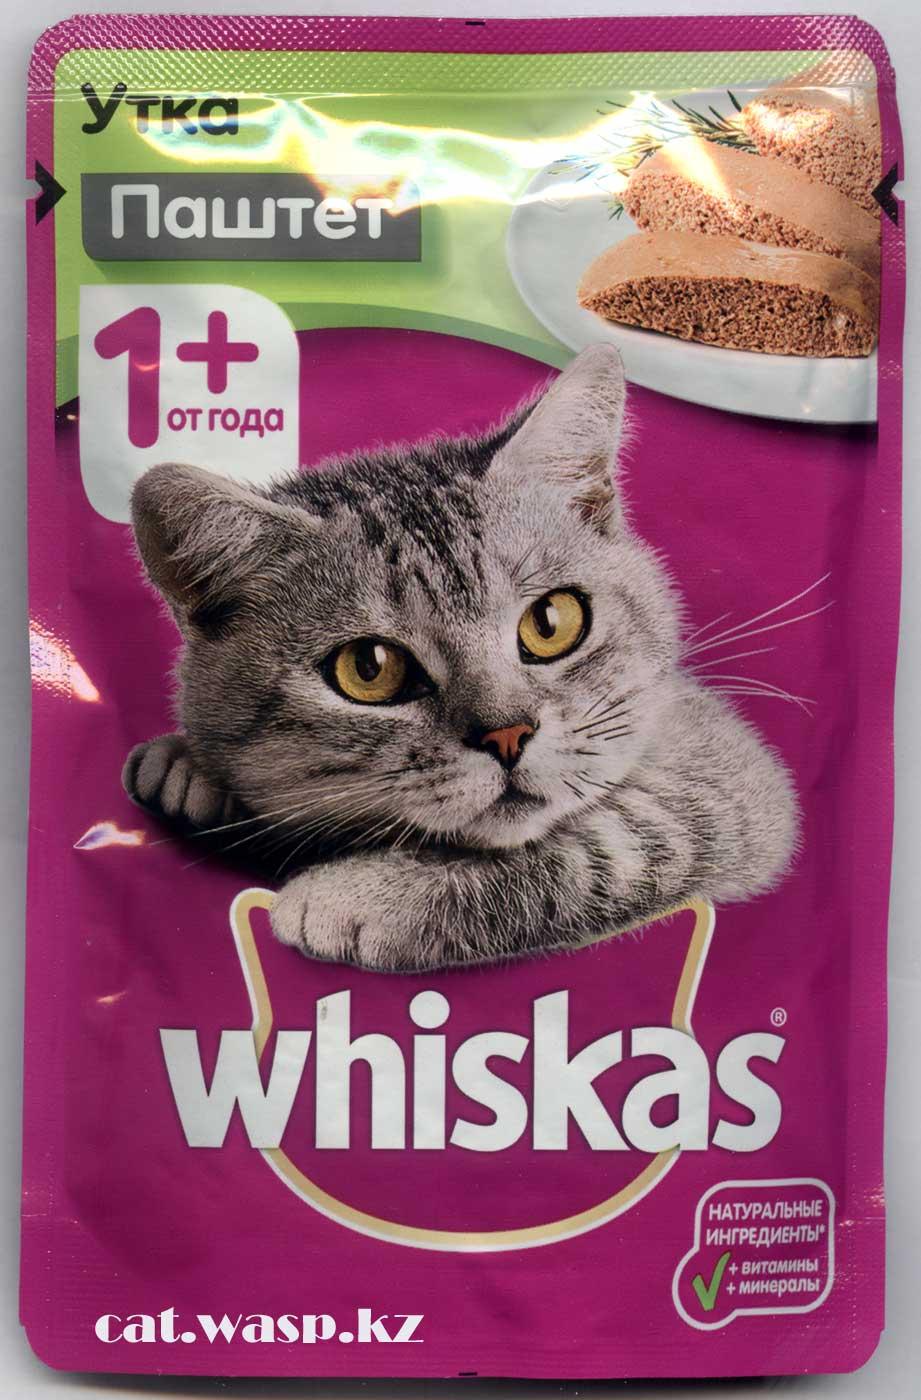 Whiskas Утка паштет 1+ от года отзыв на пакетик корма для кошек